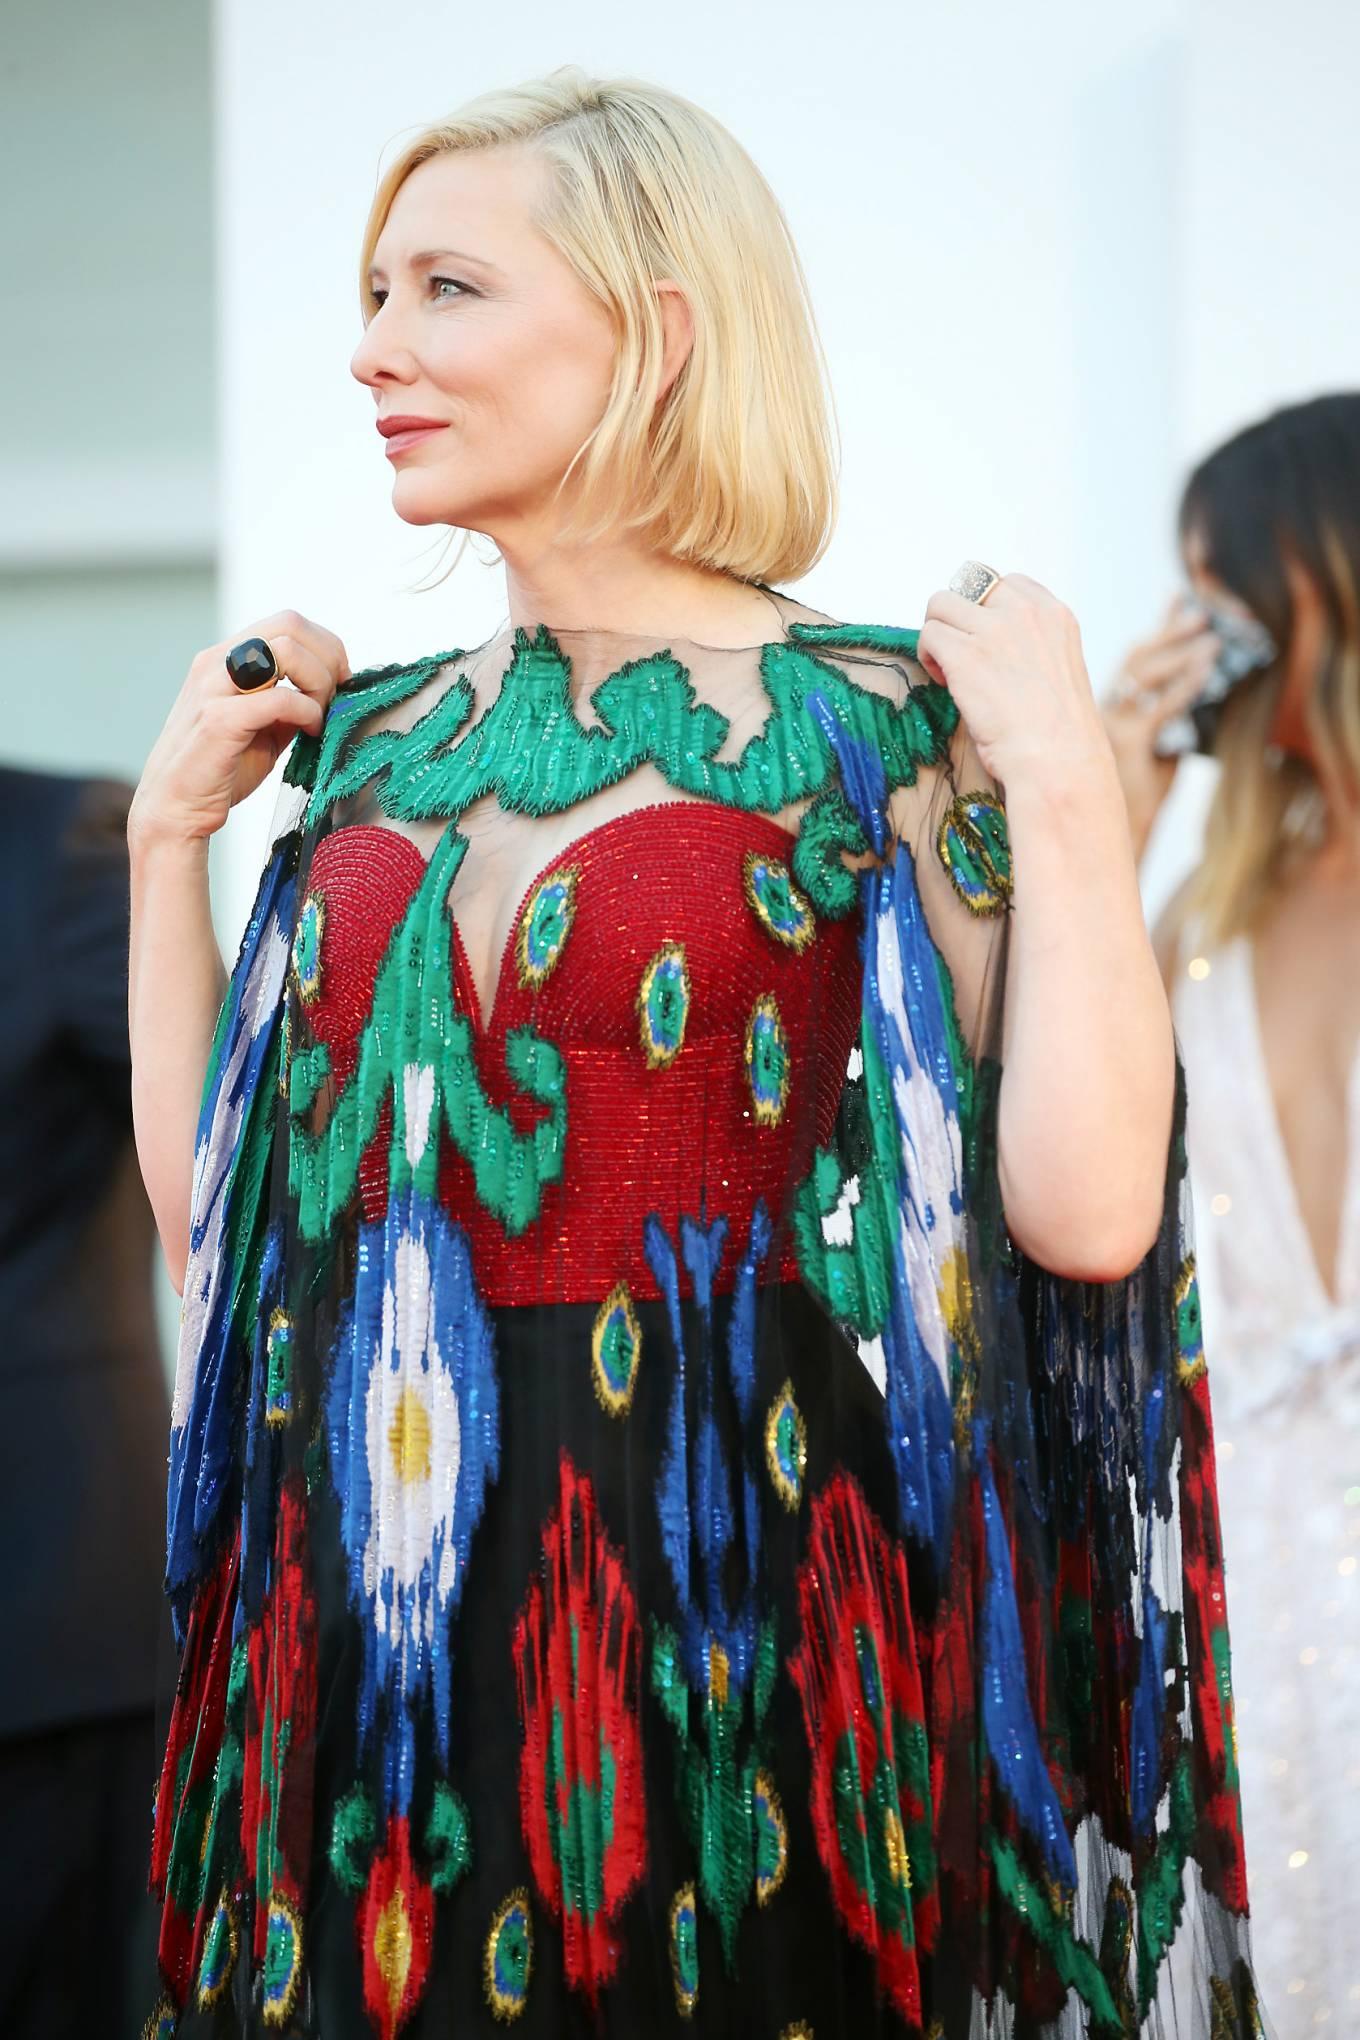 Cate Blanchett 2020 : Cate Blanchett – Closing Ceremony Red Carpet of 2020 Venice Film Festival in Venice-12